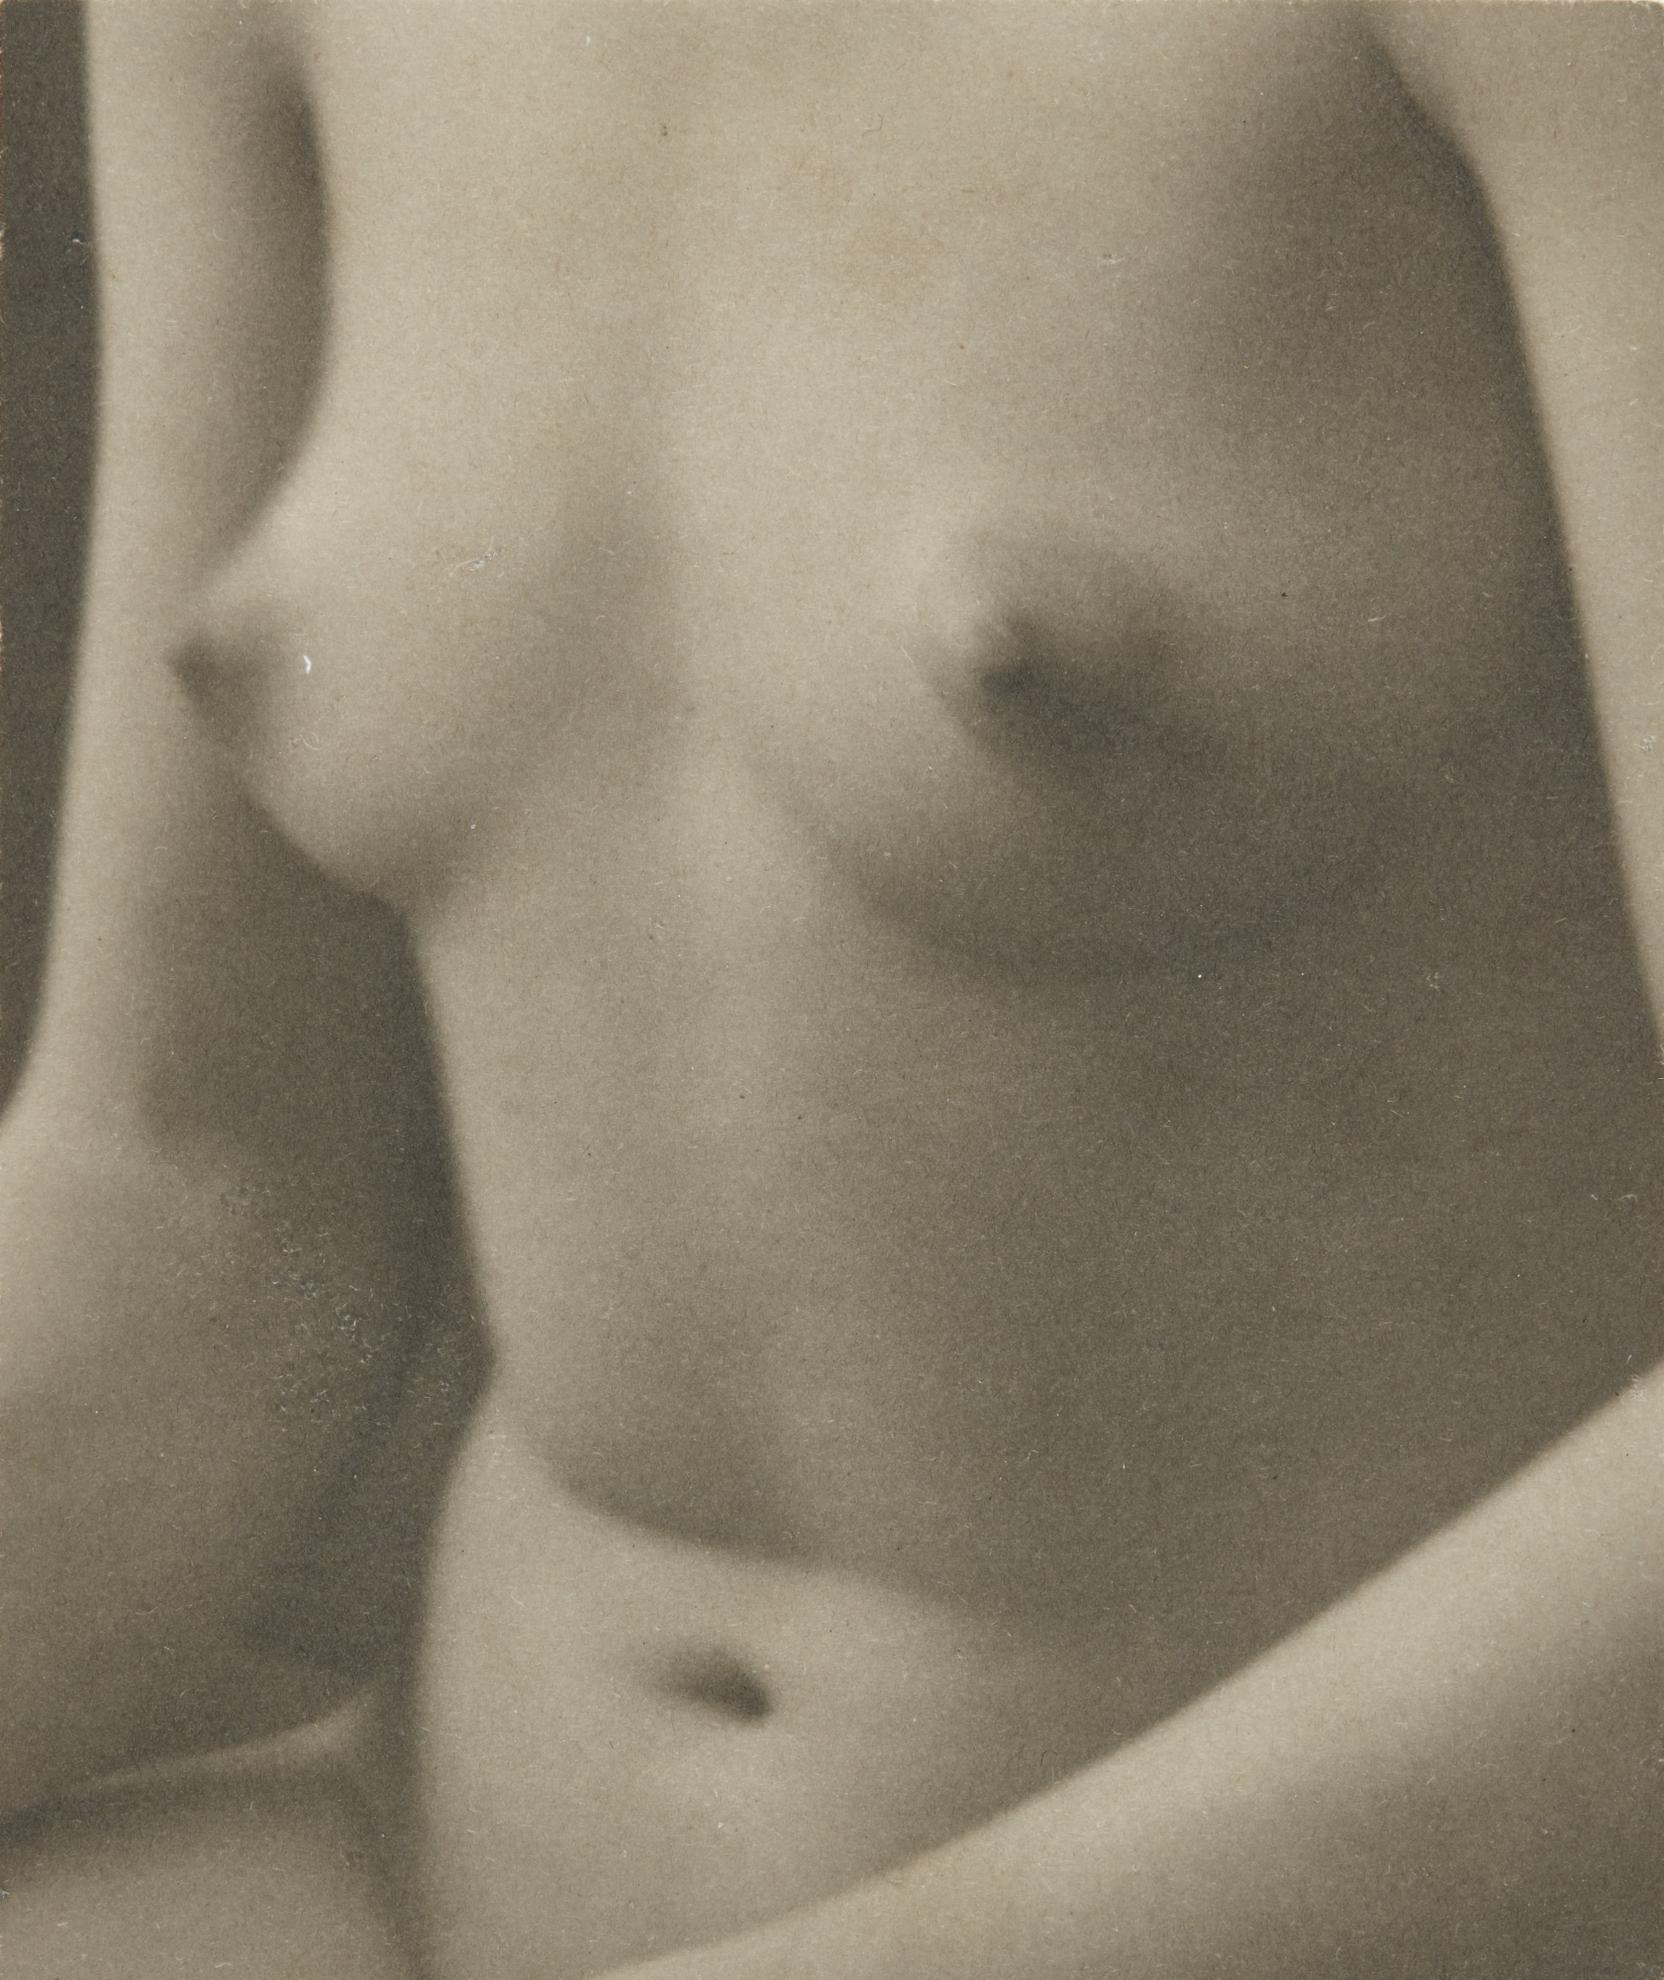 Paul Outerbridge-Nude Torso, Semi-Abstraction, 1923-1923